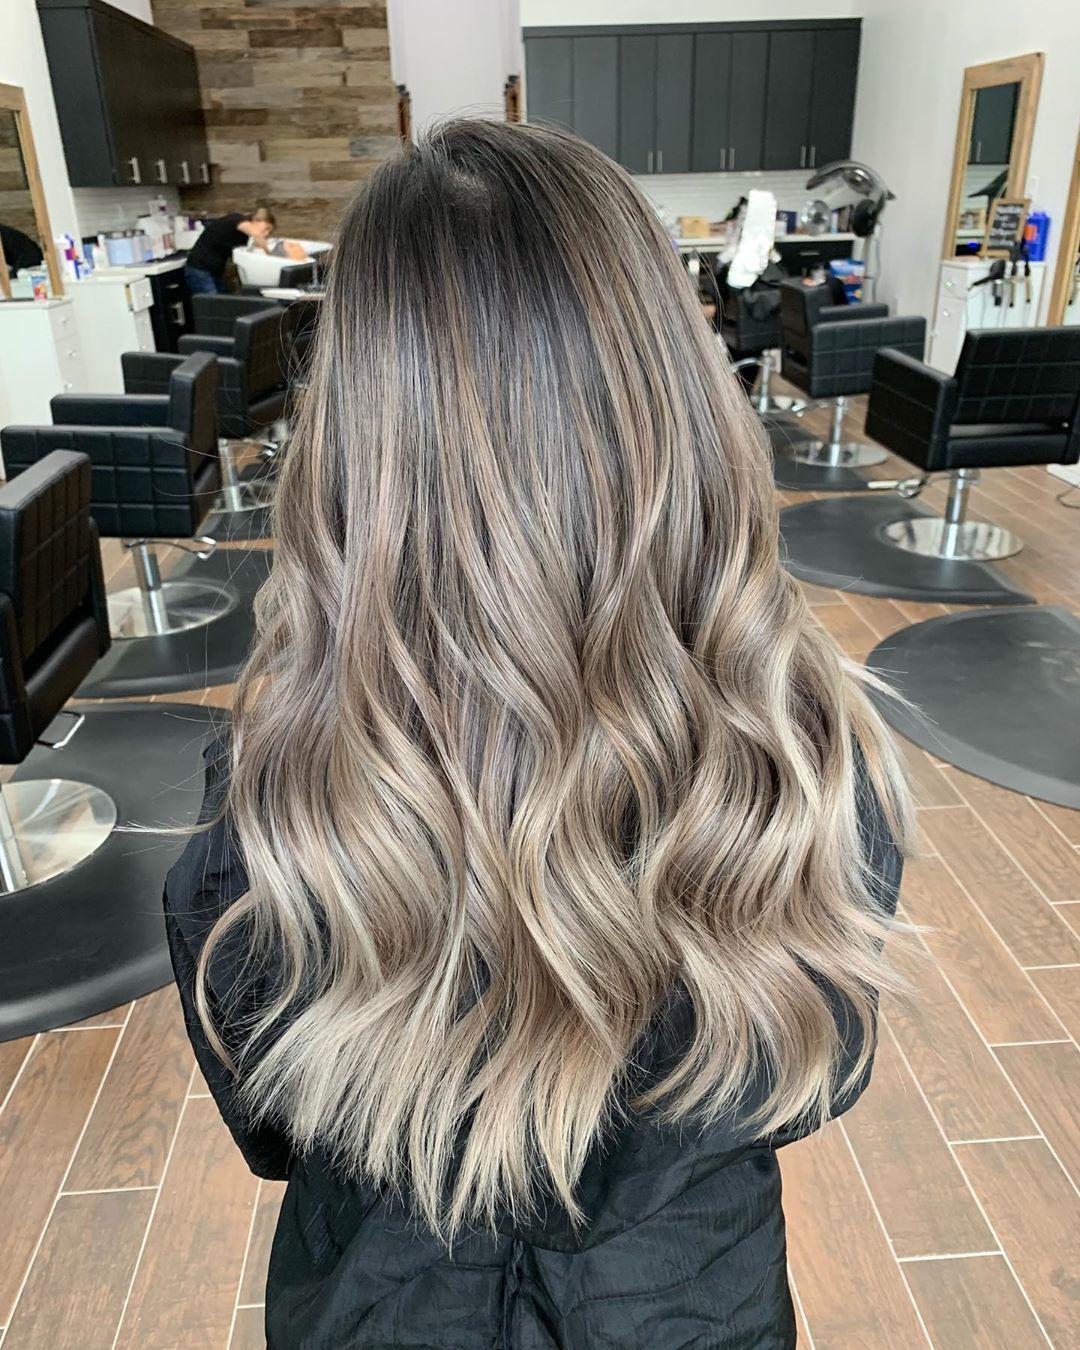 Khloe N On Instagram Mixture Of Beige And Ash Blonde Olaplex Added To All Formulas Ash Blonde Hair Balayage Beige Blonde Balayage Balayage Long Hair